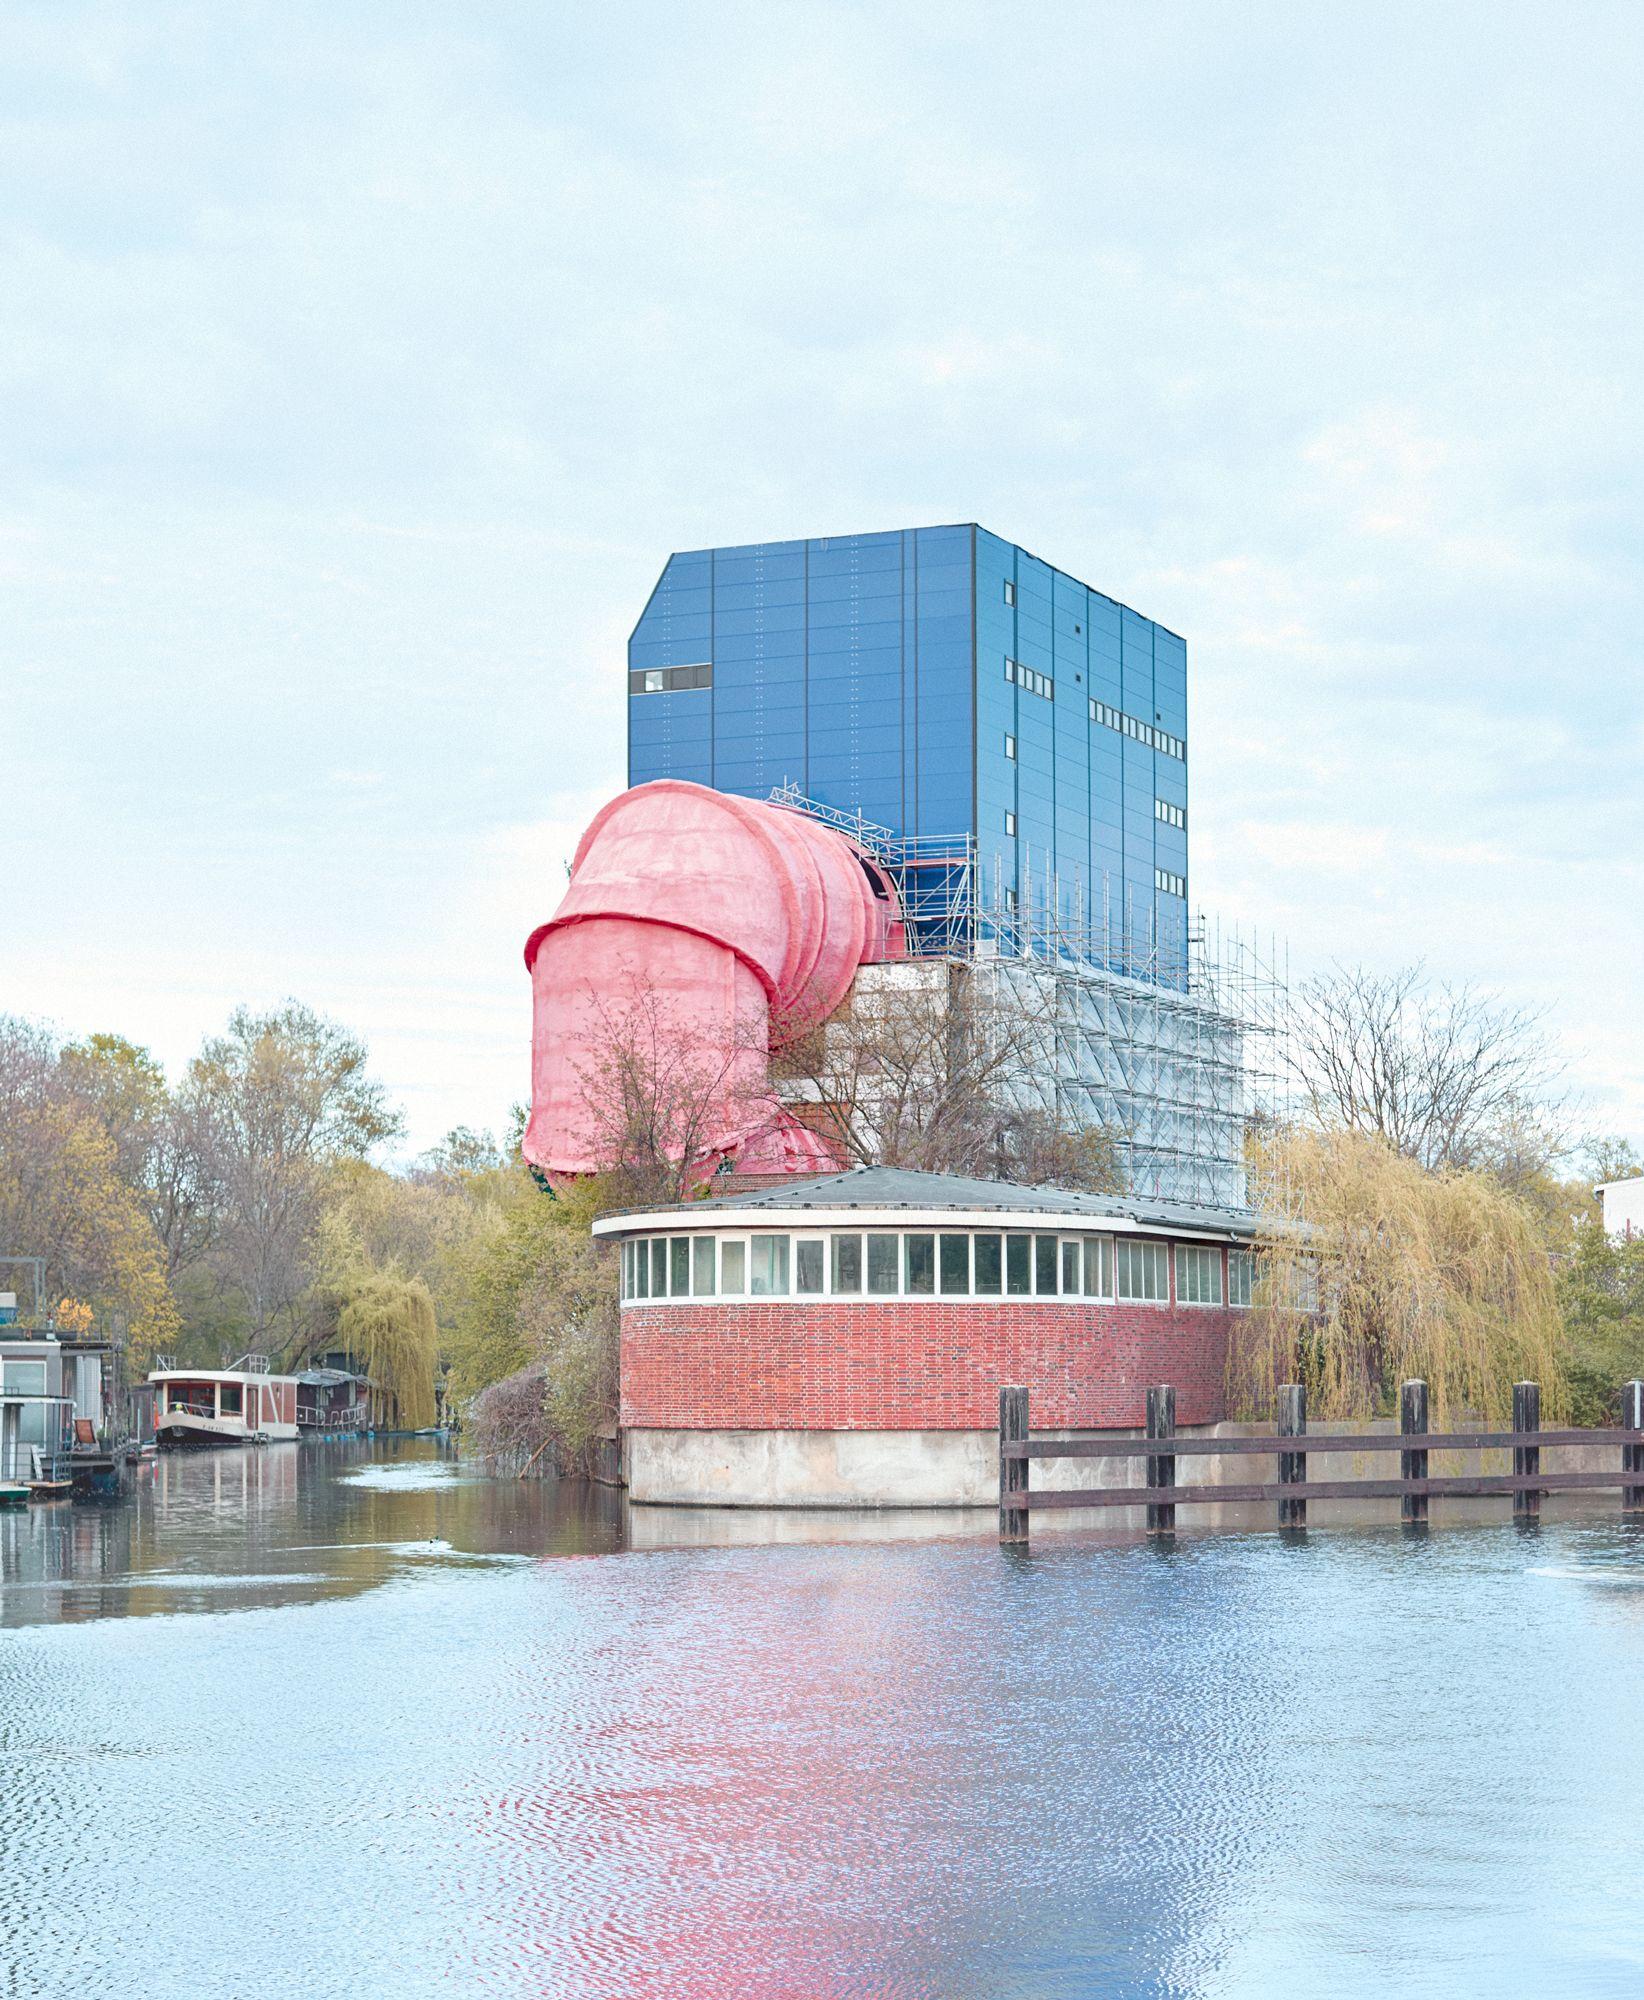 #Umlaufkanal #architecture #industrial #building #berlin #germany #visit #travel #travelblog #travelphotography #cycledandcaptured